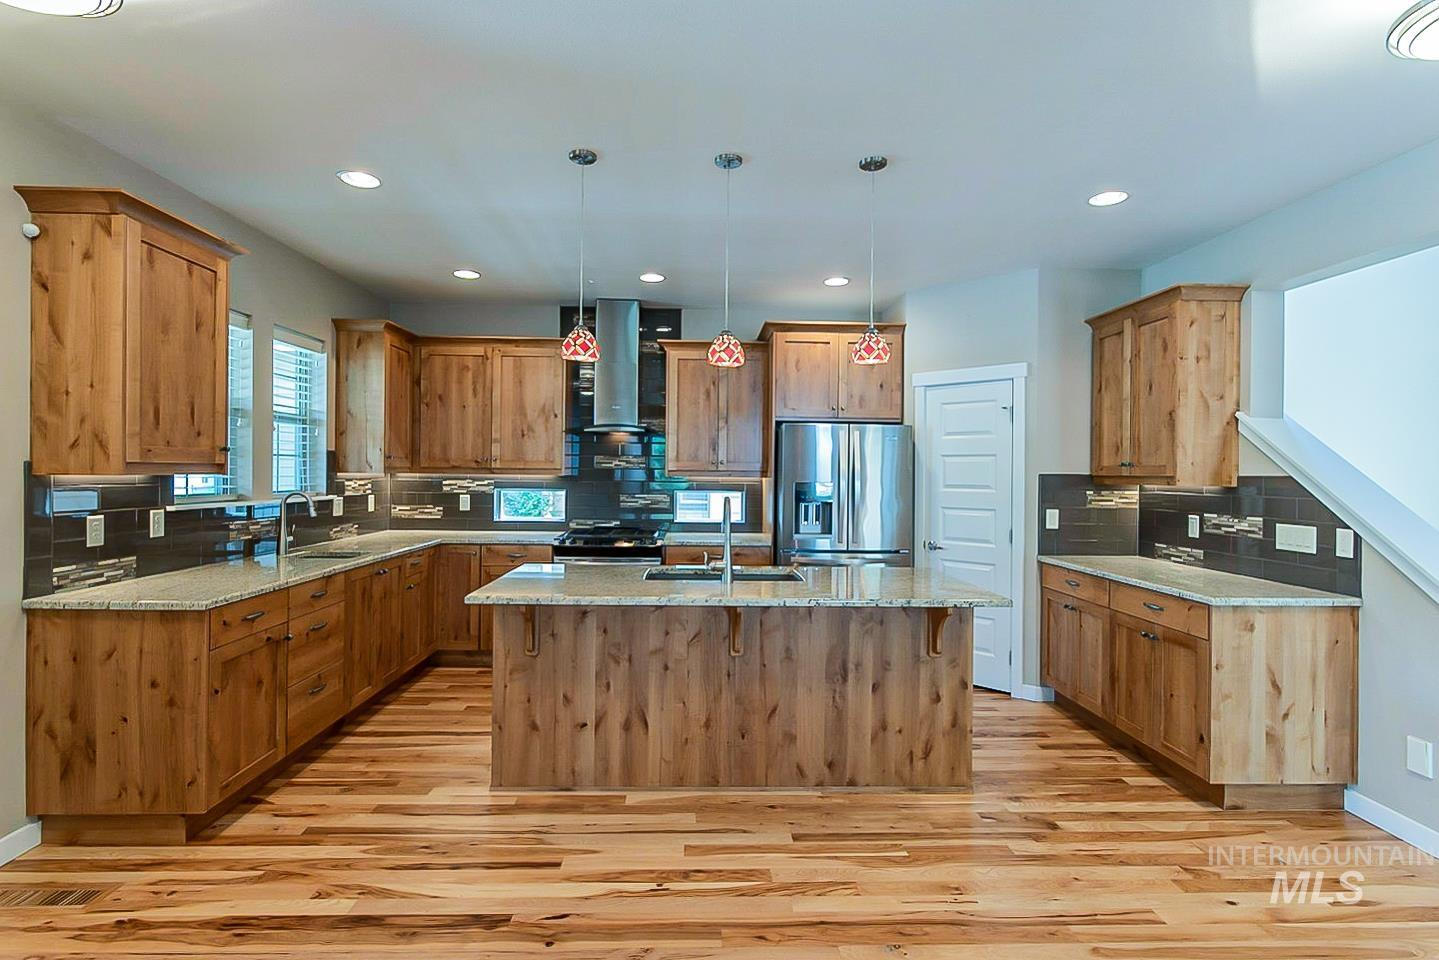 3729 W Catalpa Property Photo 4